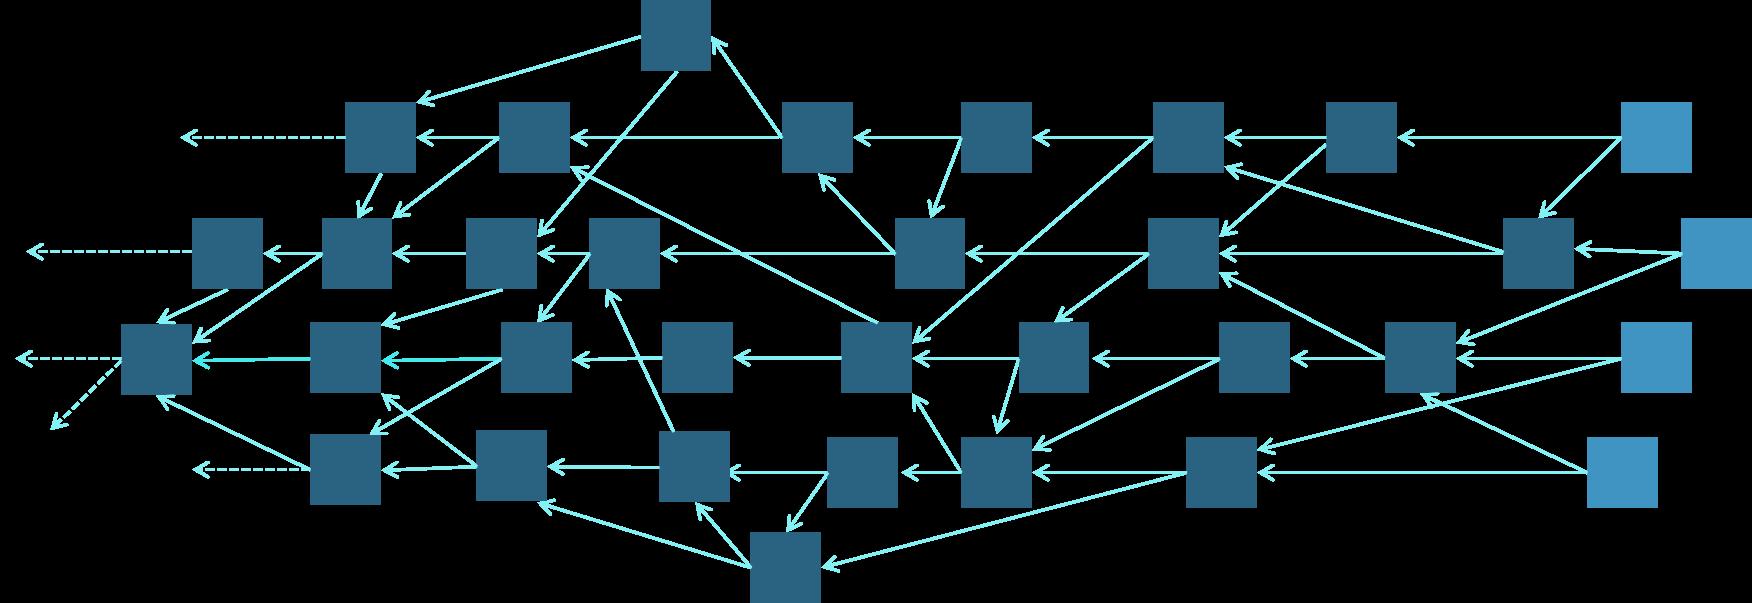 Figure 8: A DAG based distributed ledger. Image reference: Capgemini